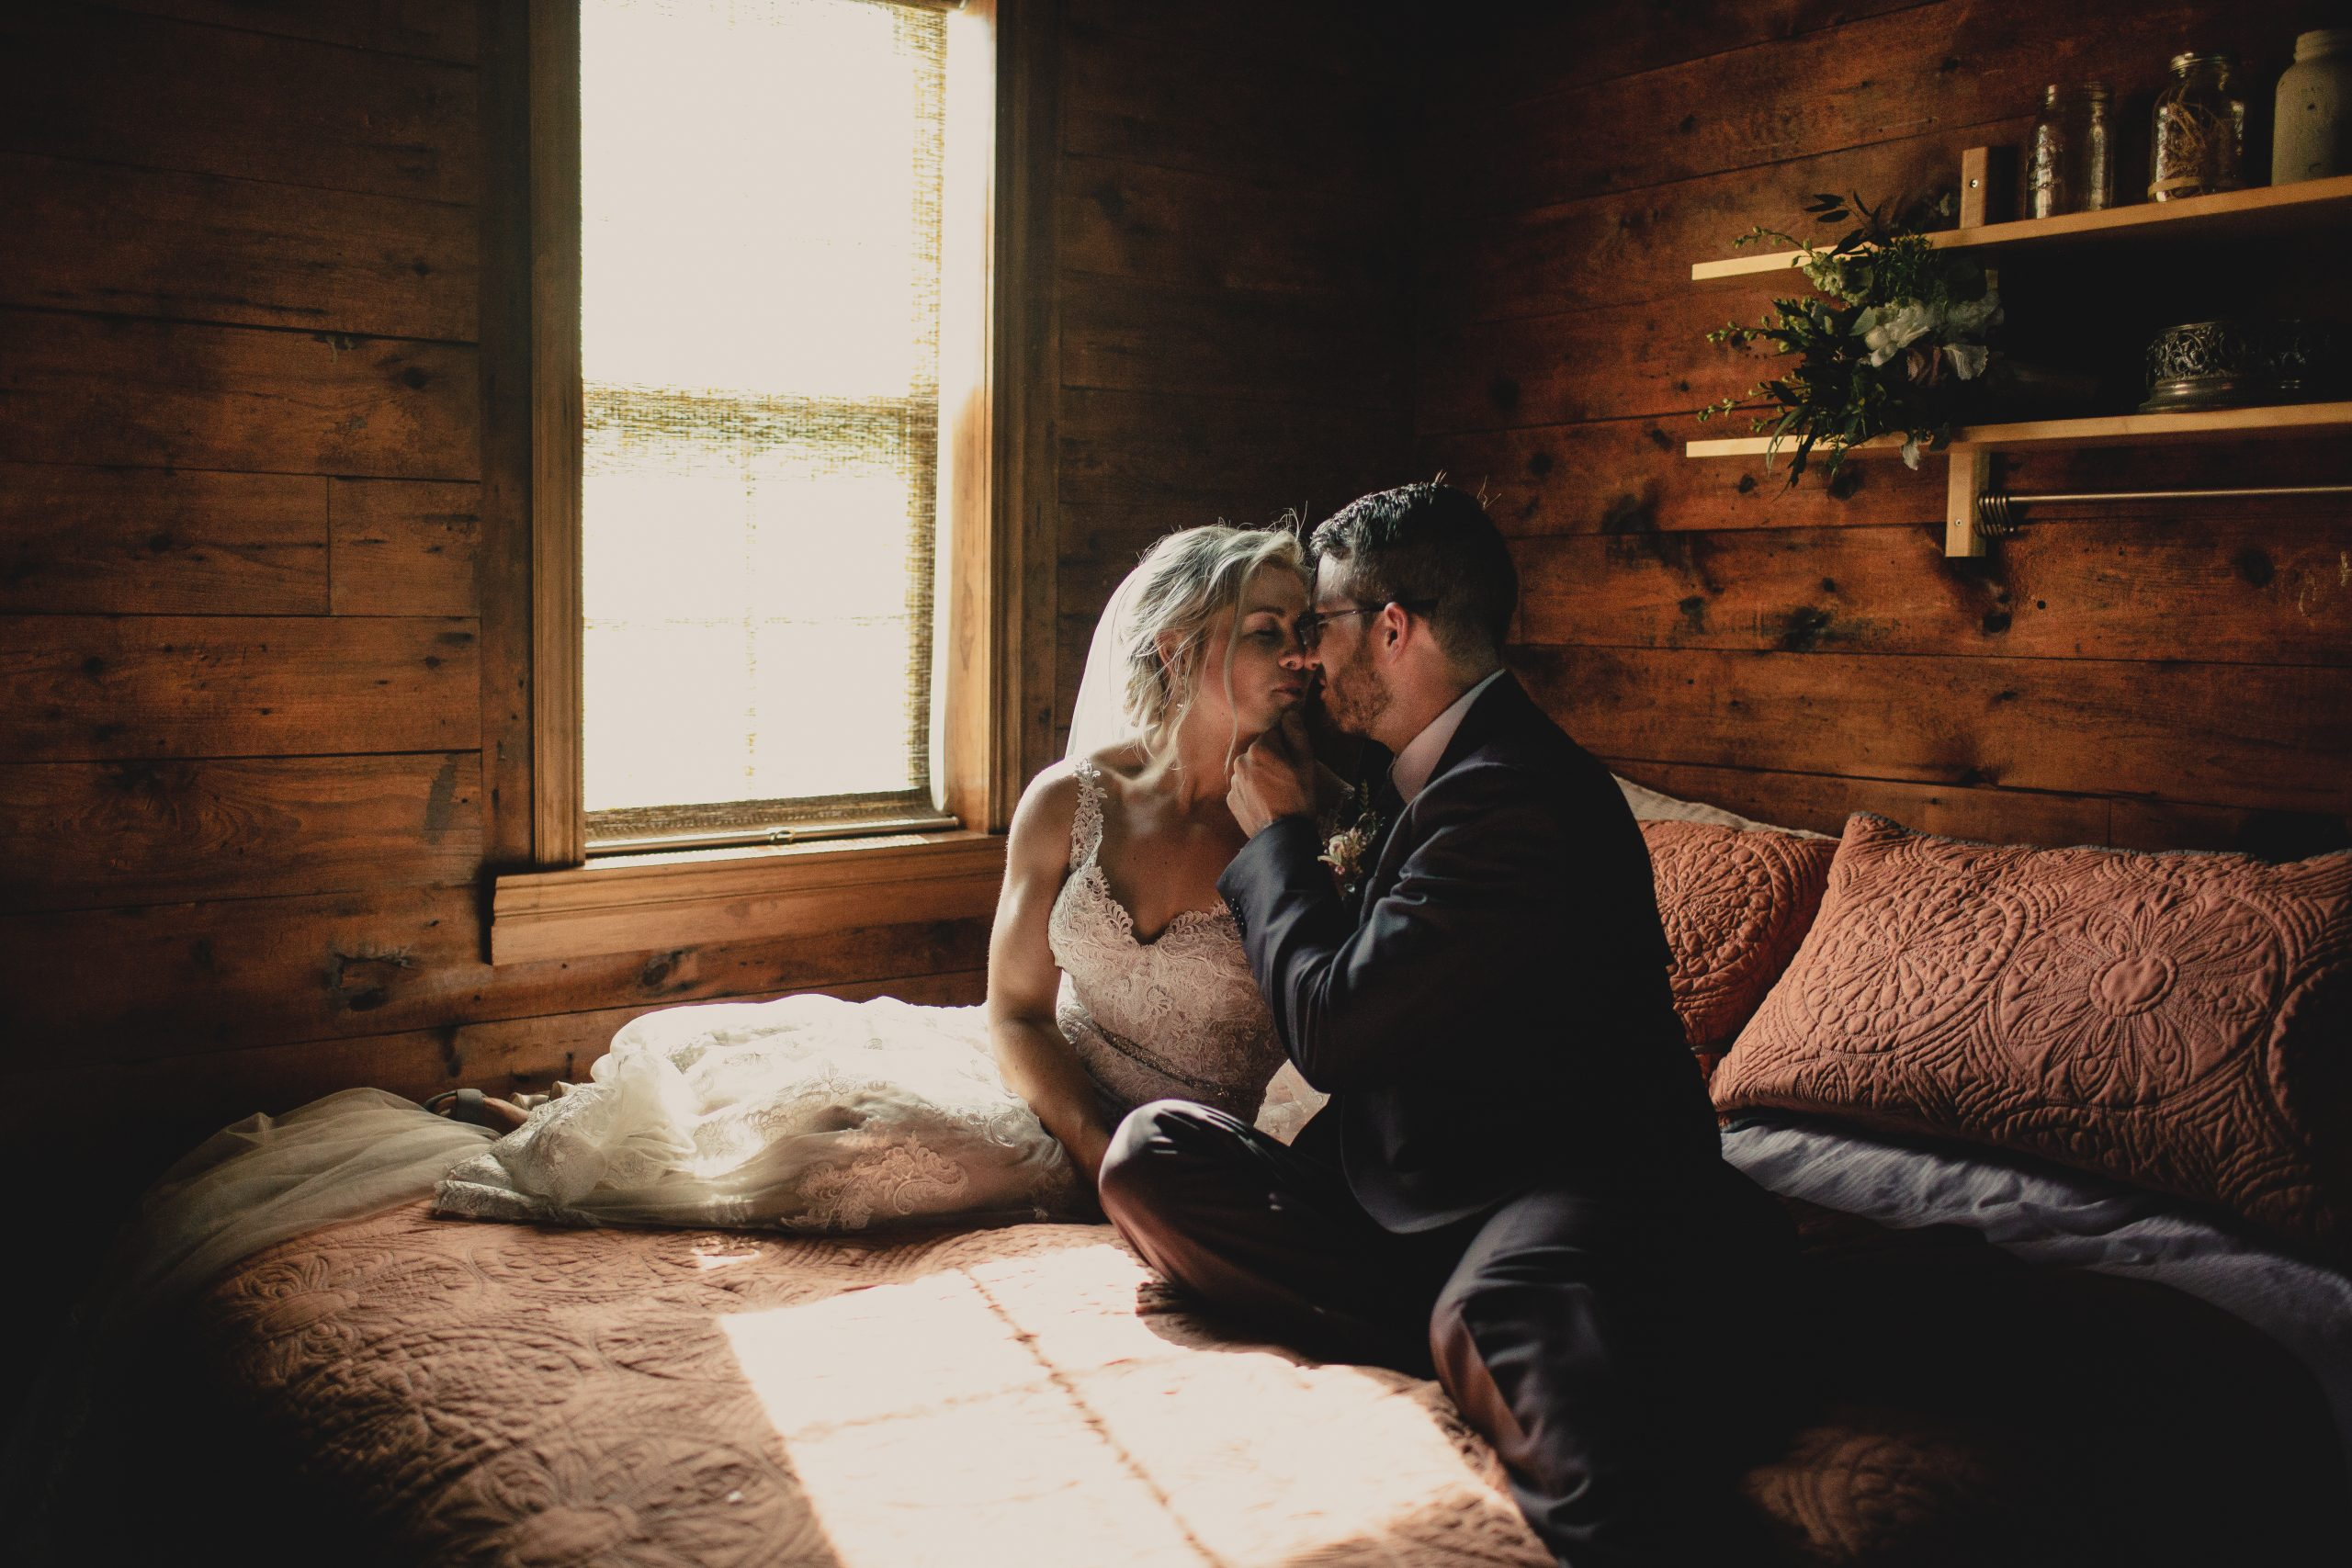 man and woman quarantine during wedding because of coronavirus